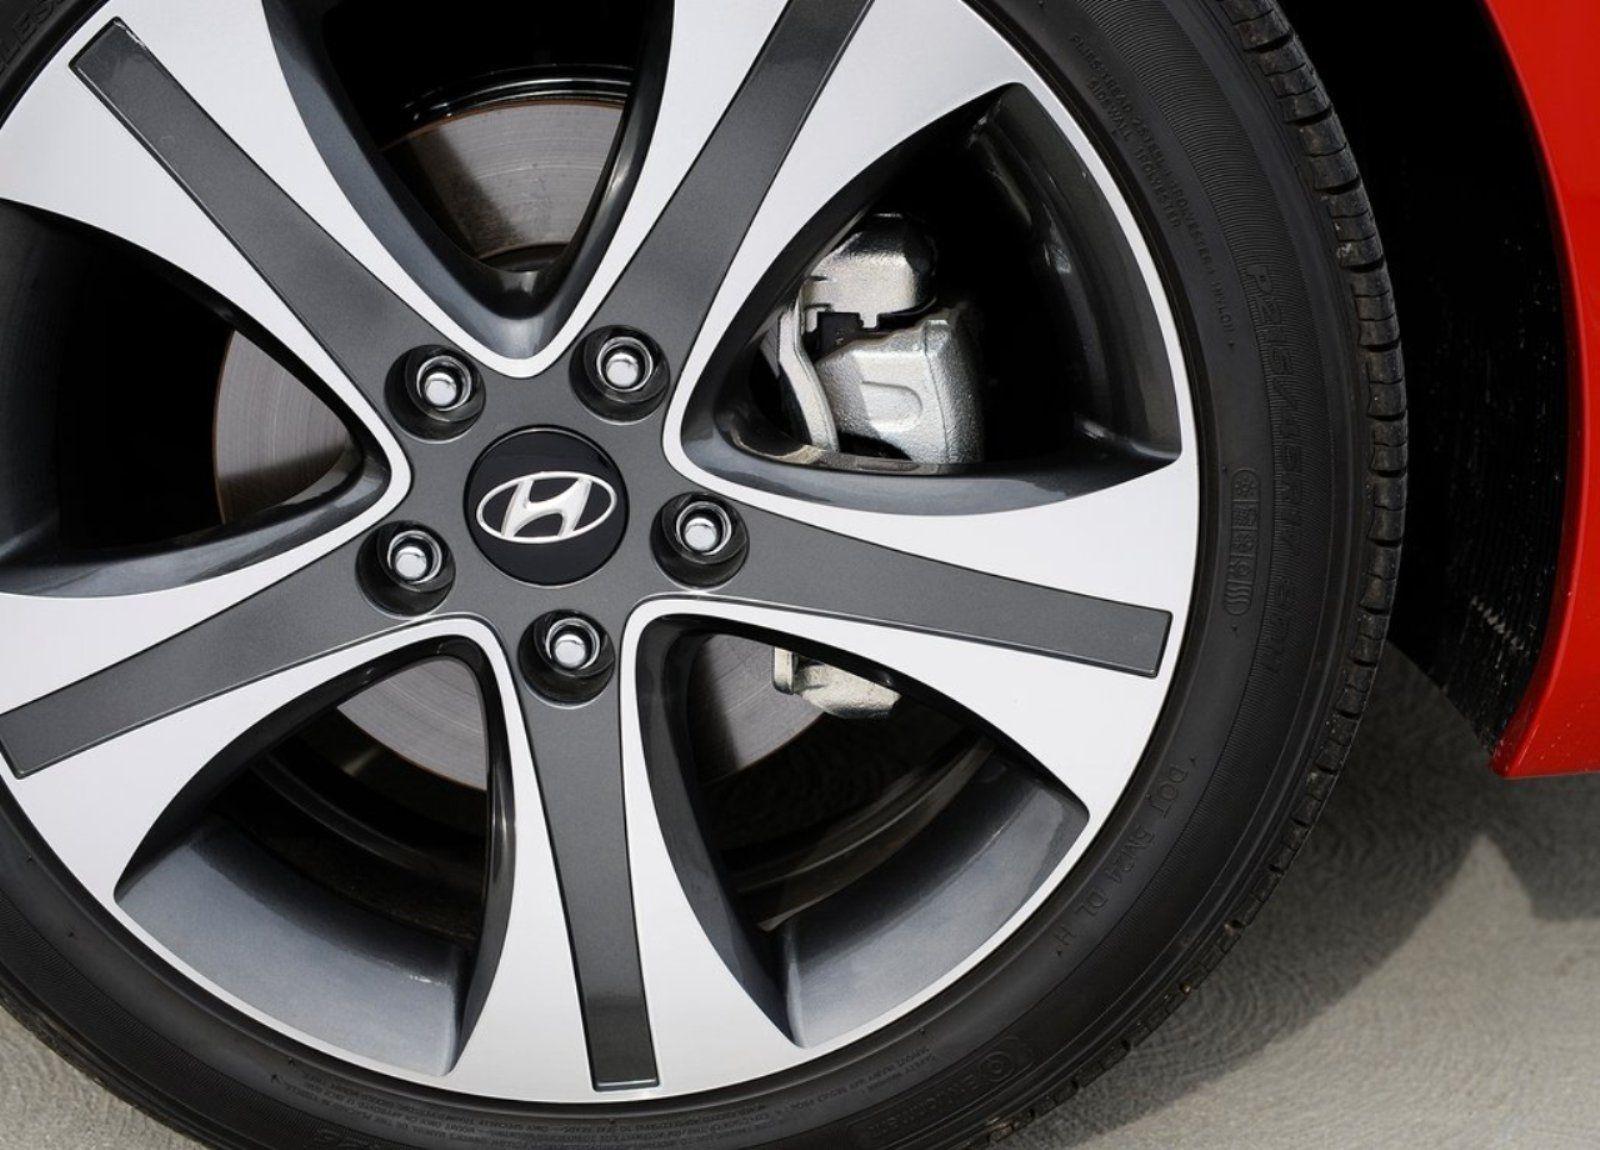 Wheels For All Cars Elantra Elantra Coupe Hyundai Elantra